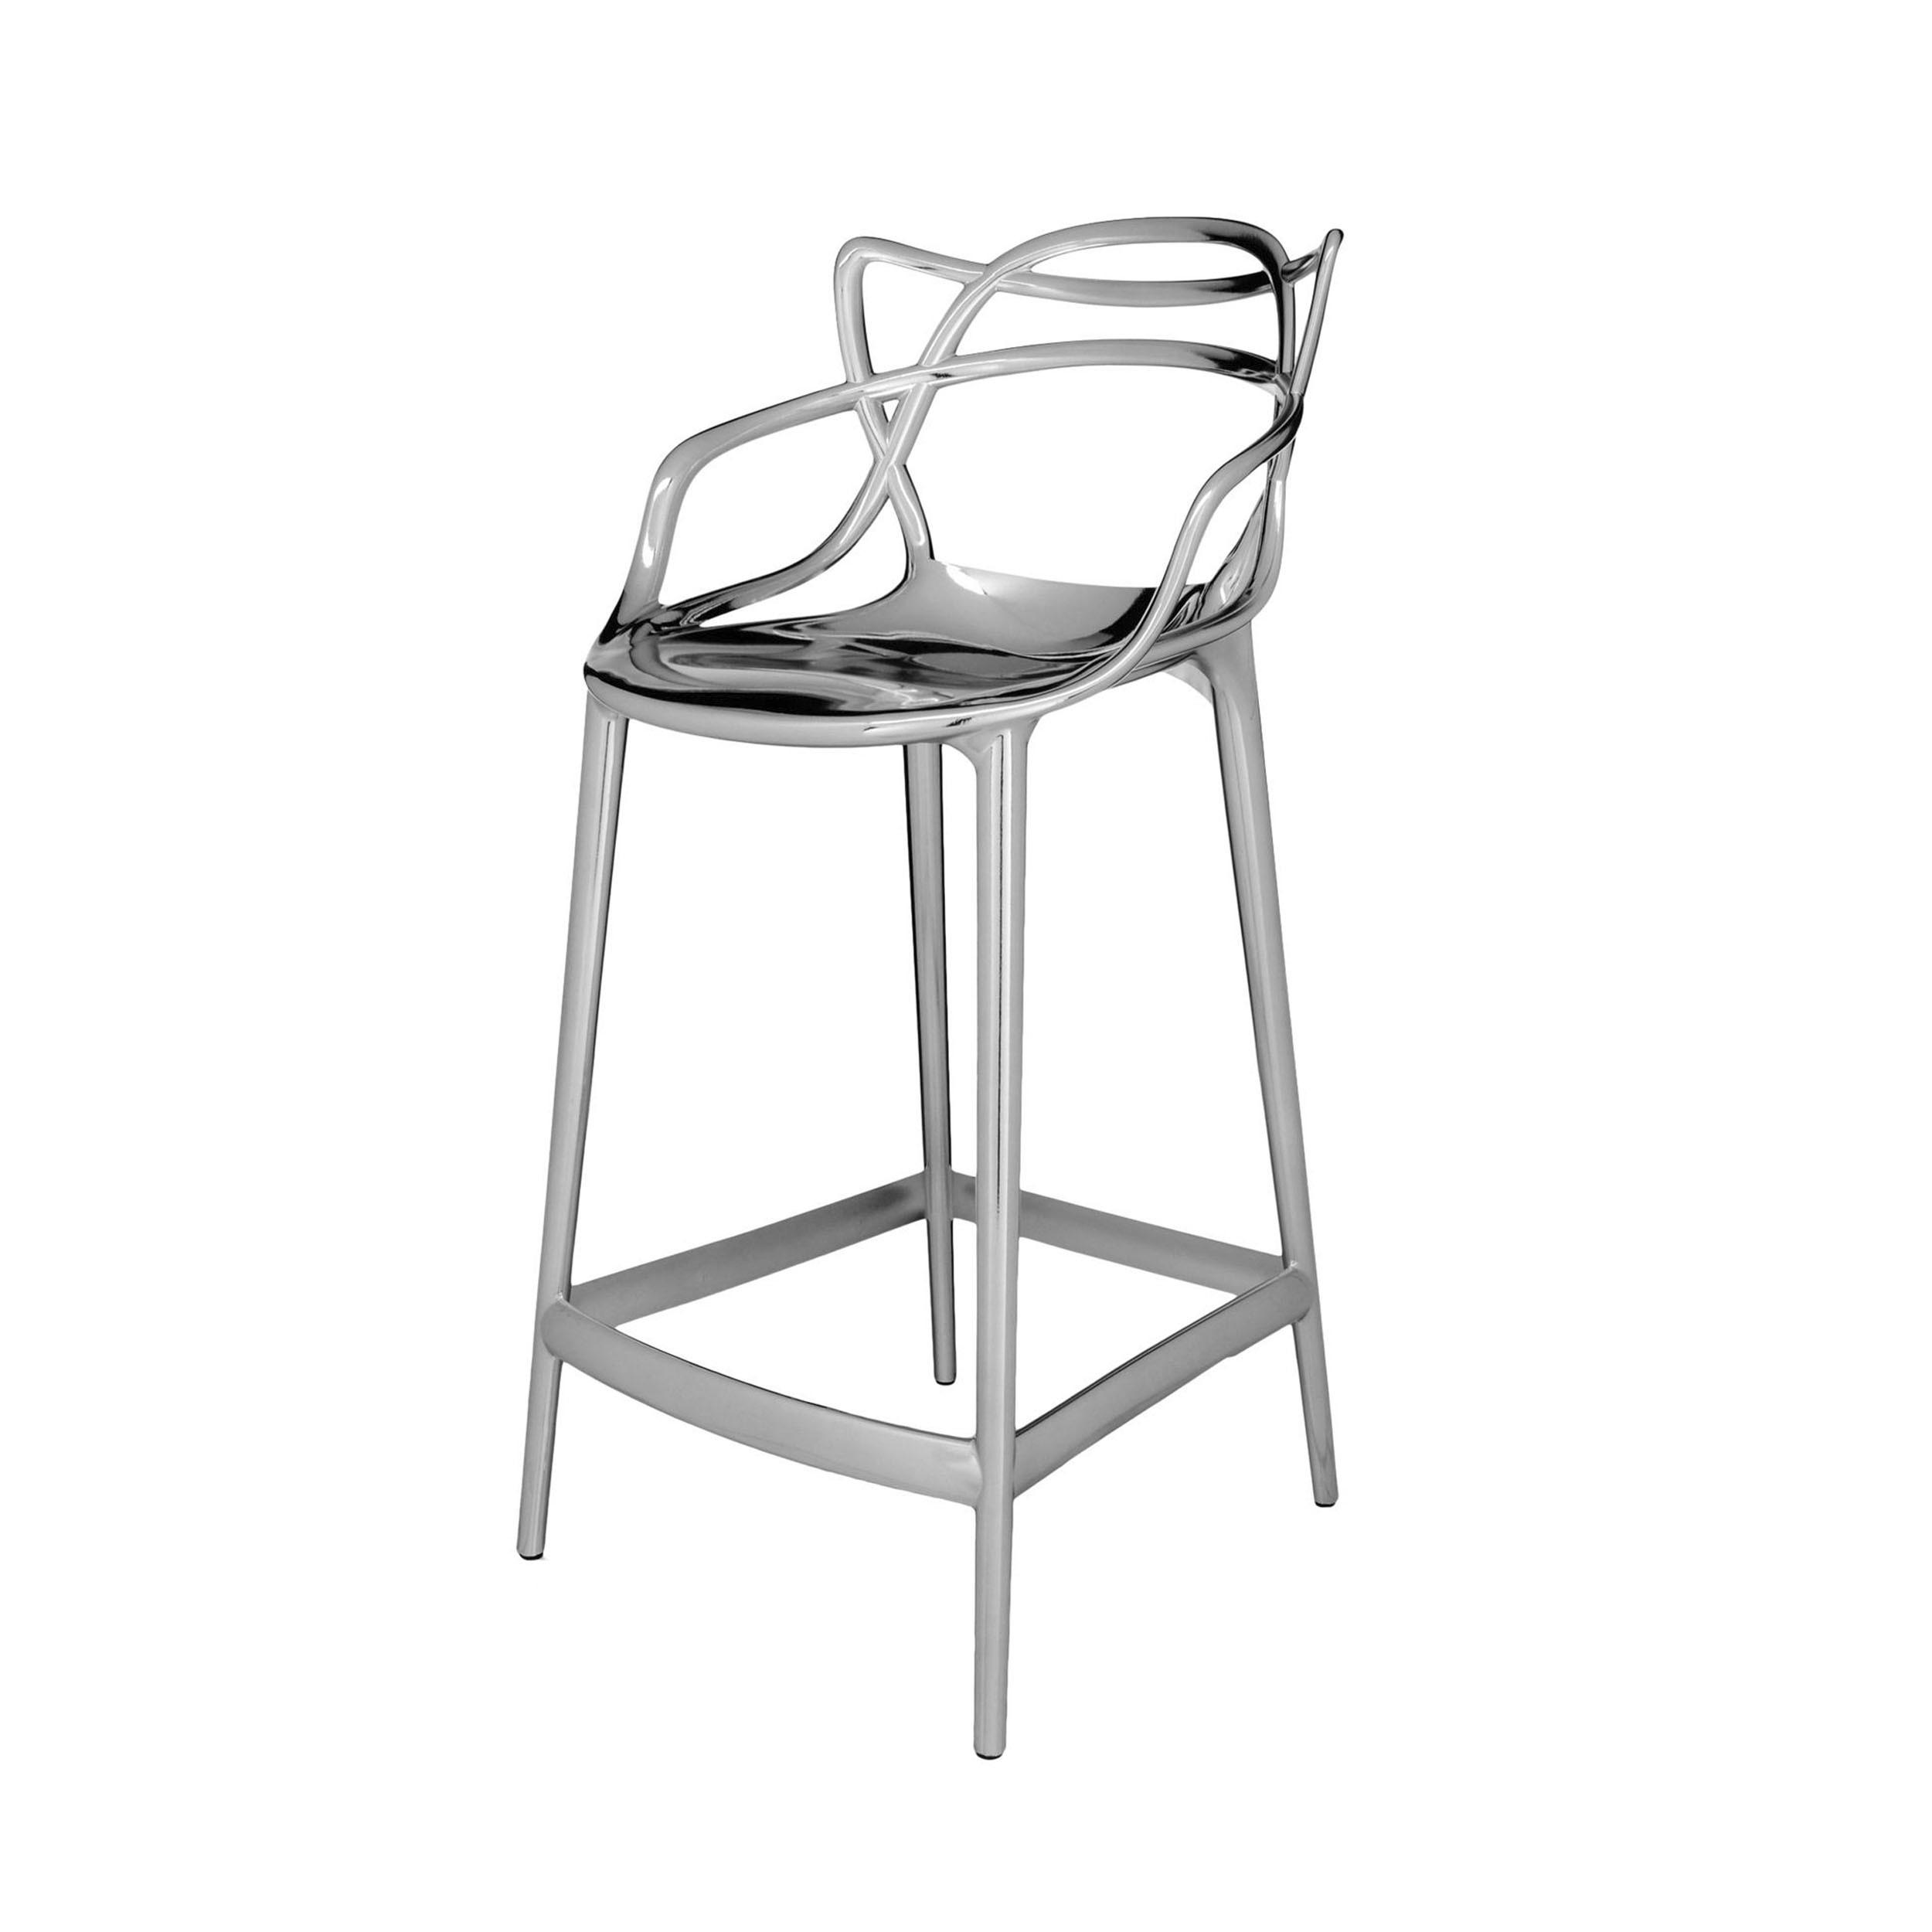 Masters stool barhocker chrom 99 online - Barhocker poco ...